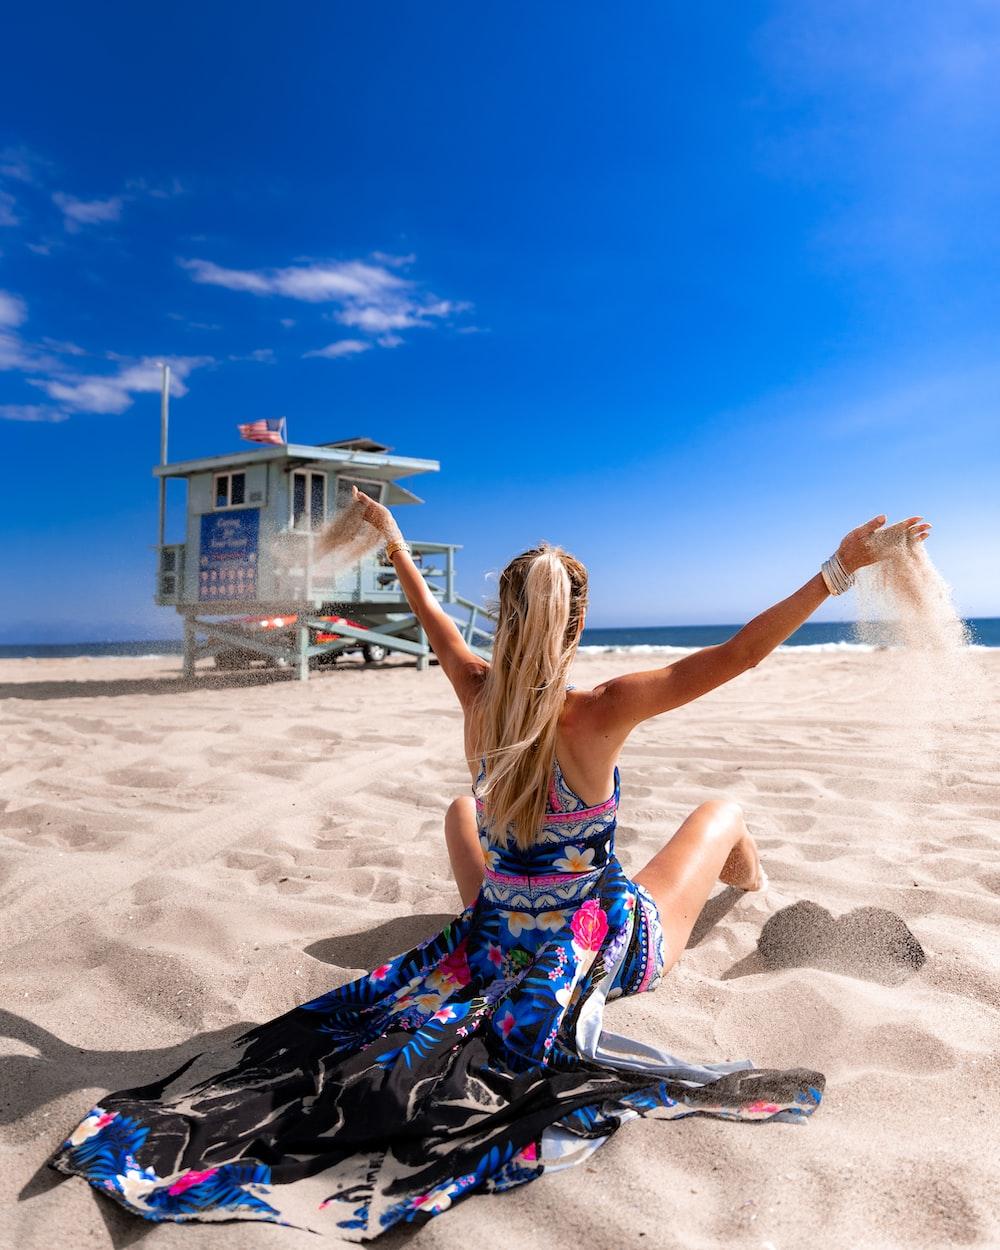 woman sitting on beach sand